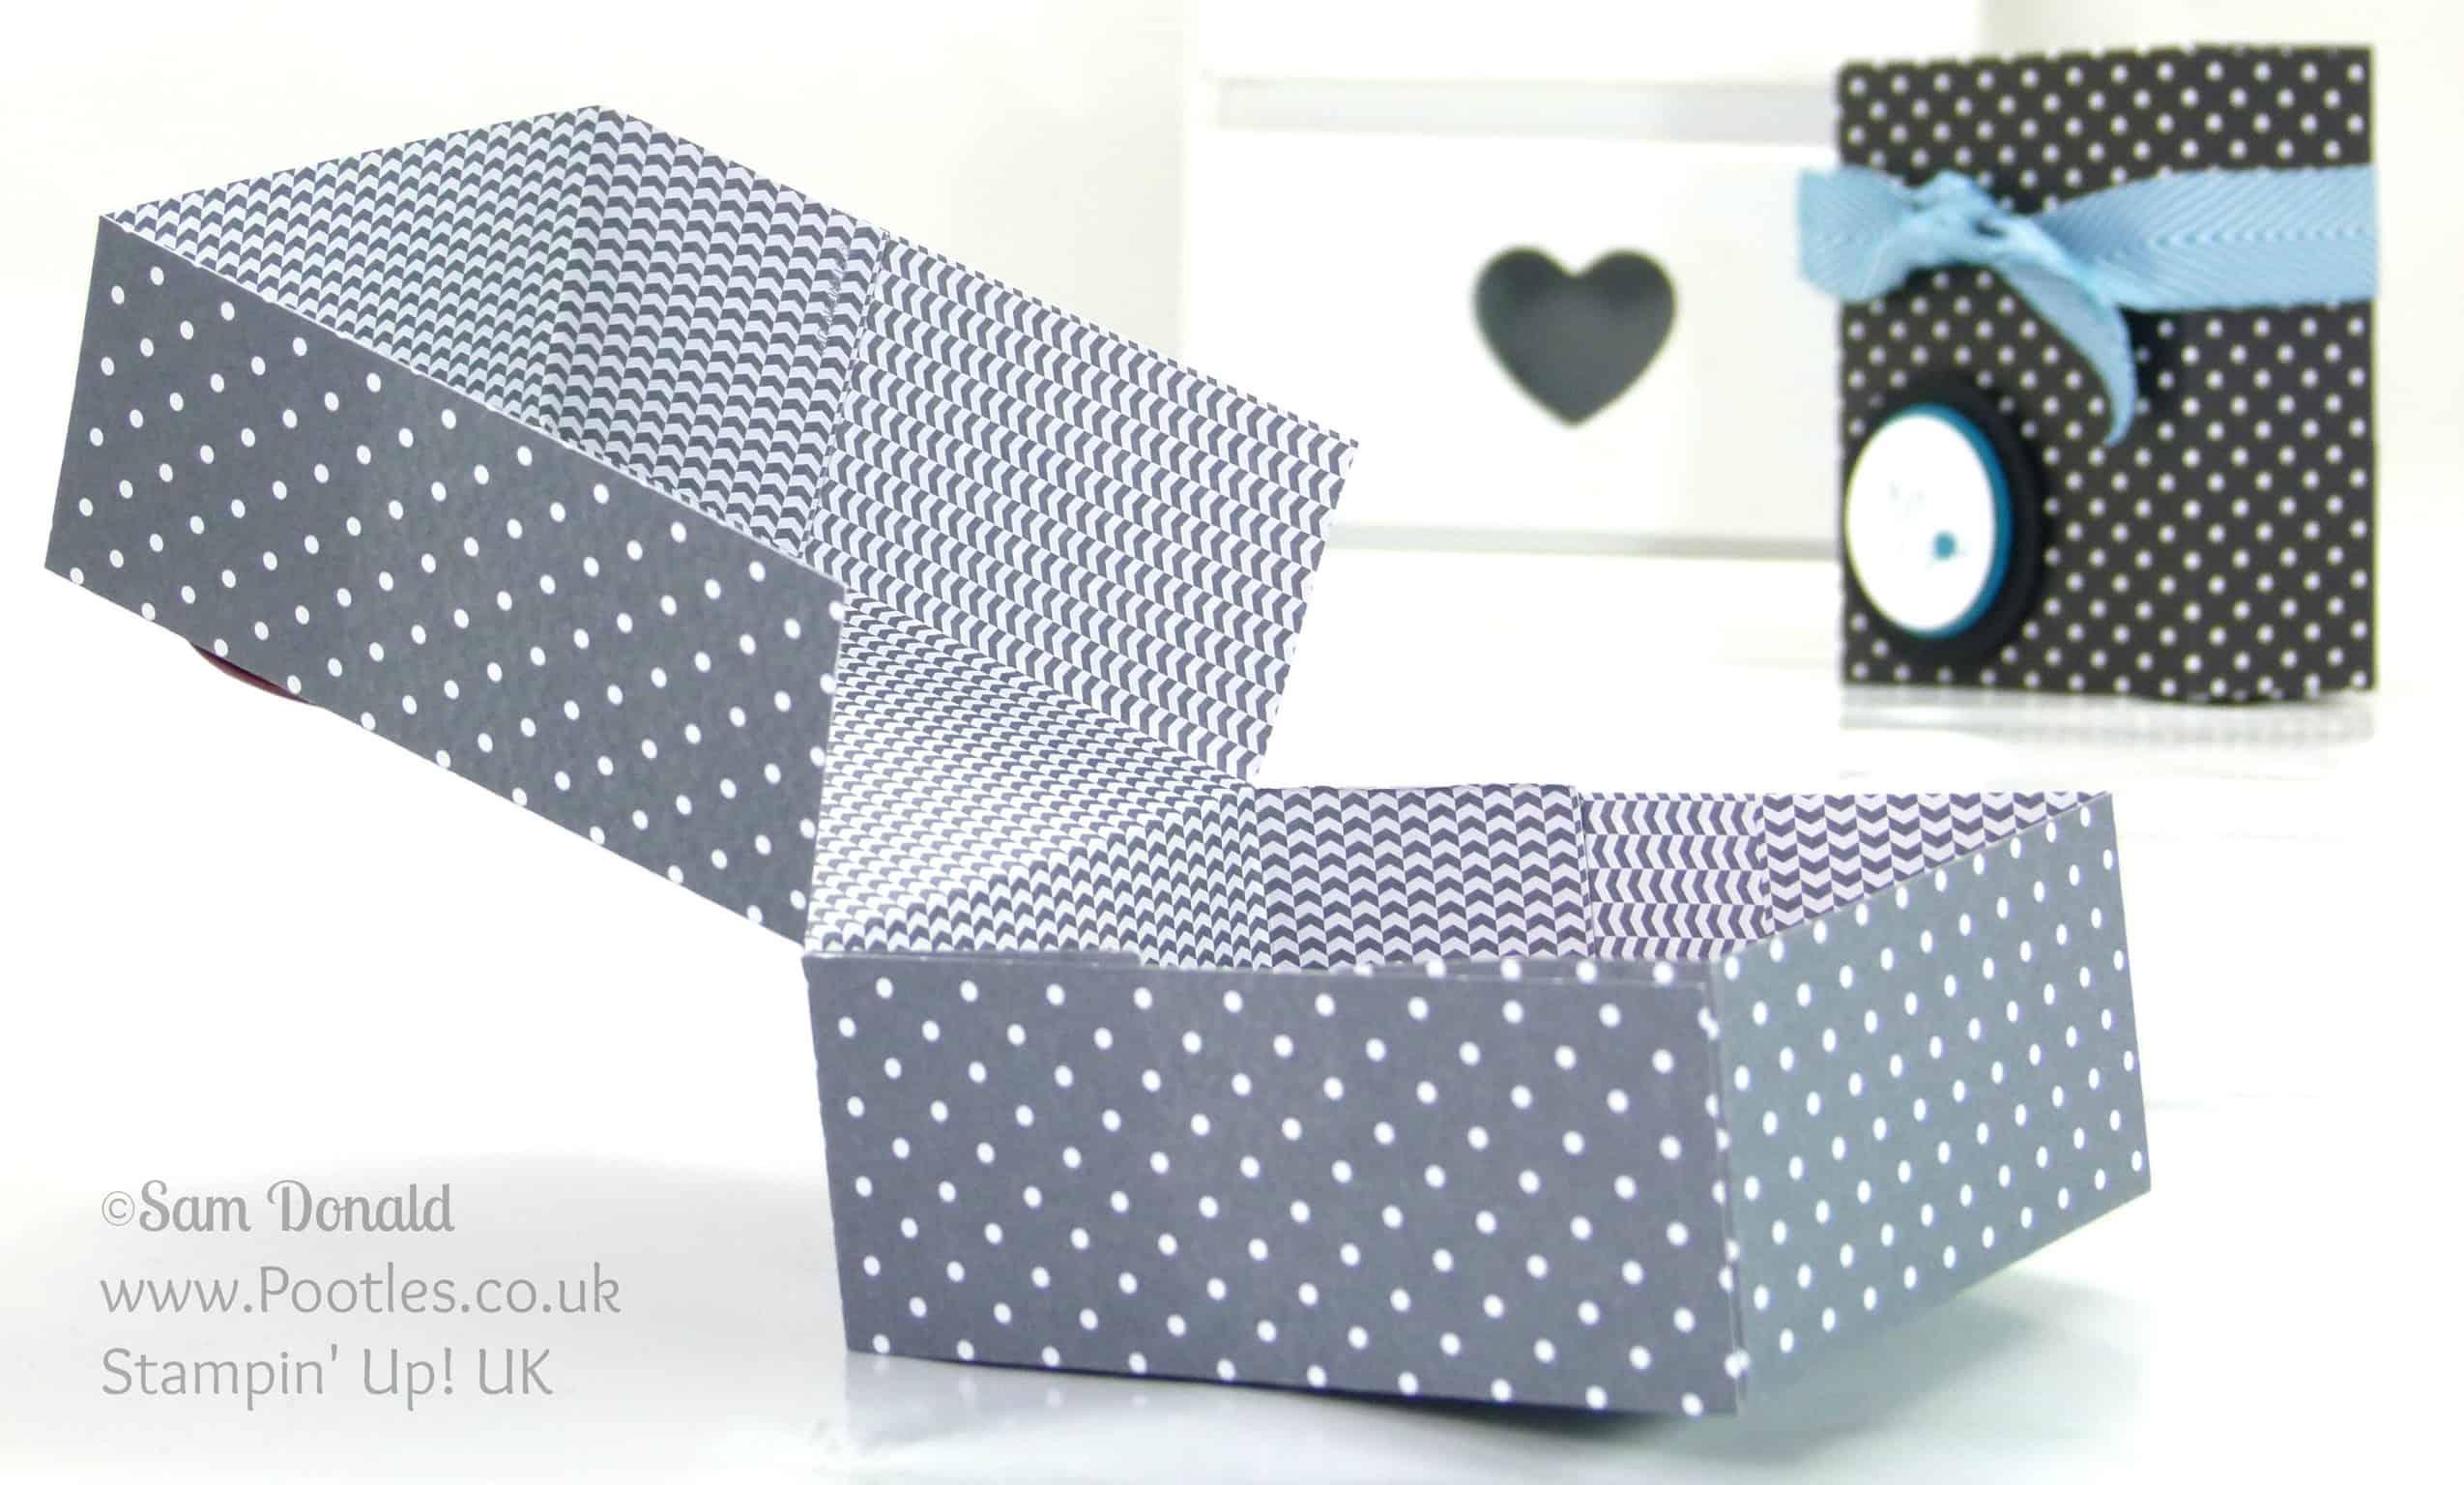 Stampin' Up! UK Independent Demonstrator Pootles. Paper Box Tutorial using Stampin' Up Designer Paper Open